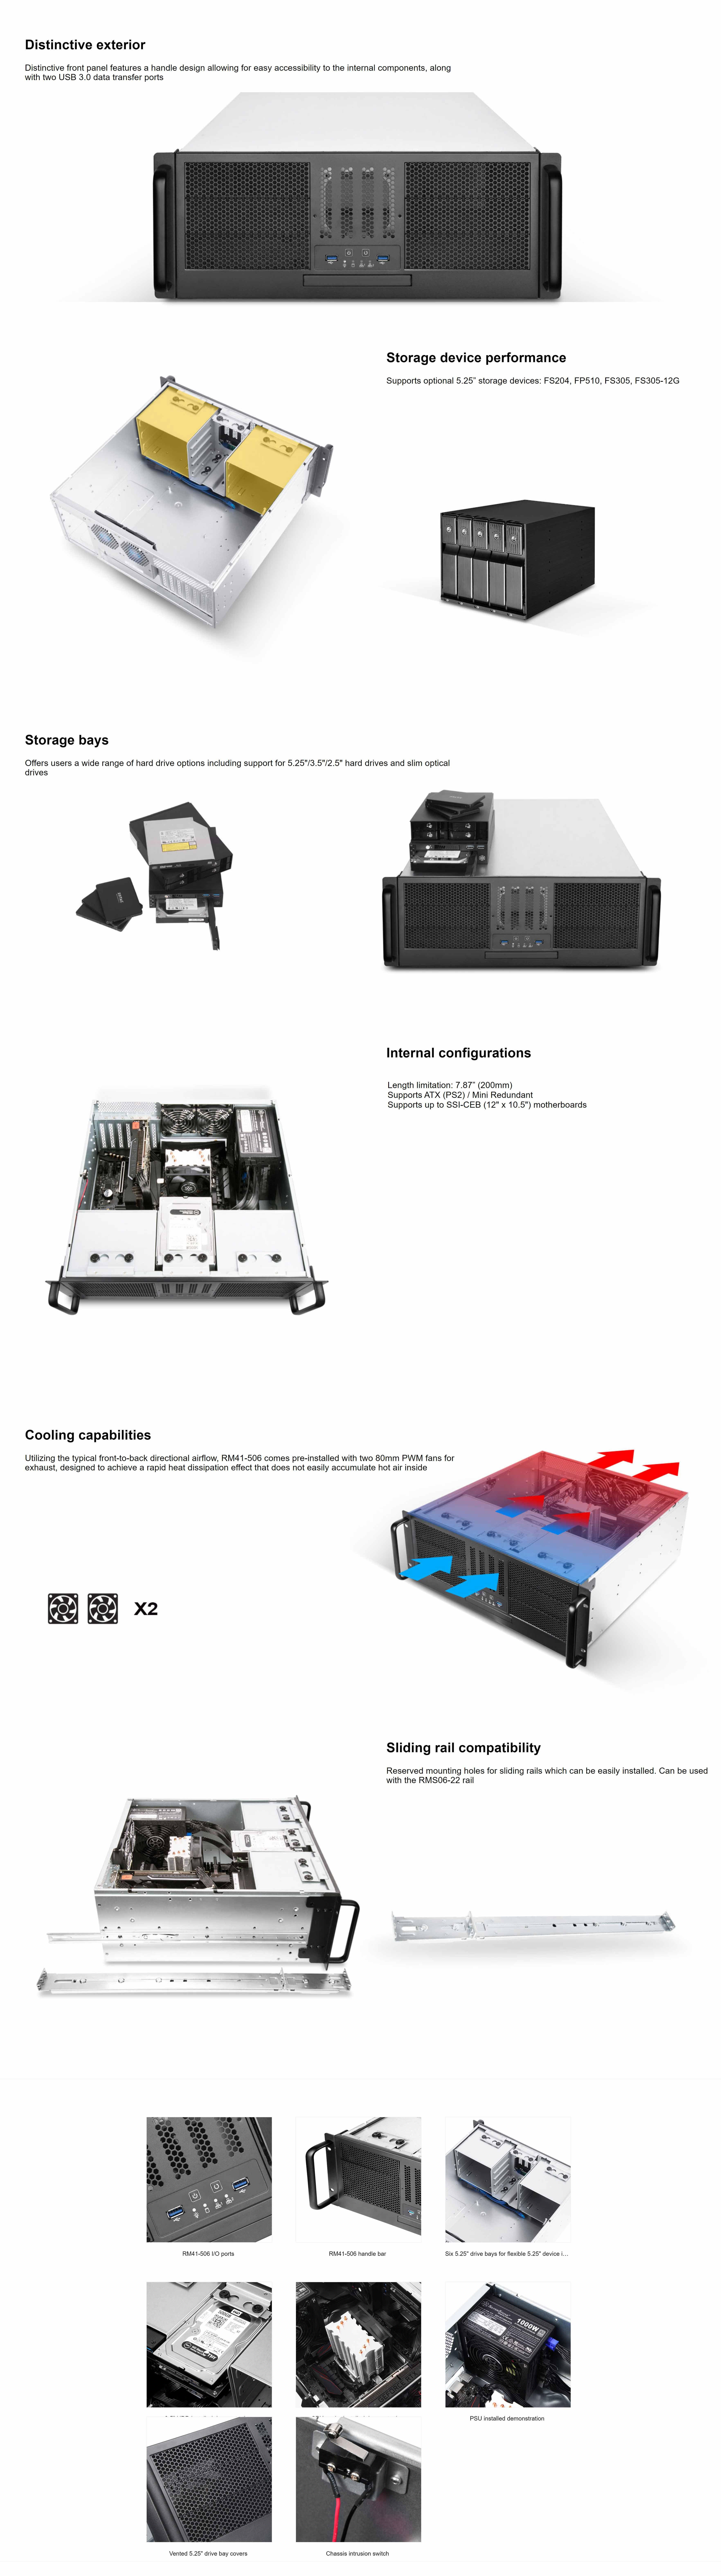 screencapture-silverstonetek-product-php-2020-01-09-12_28_21.jpg